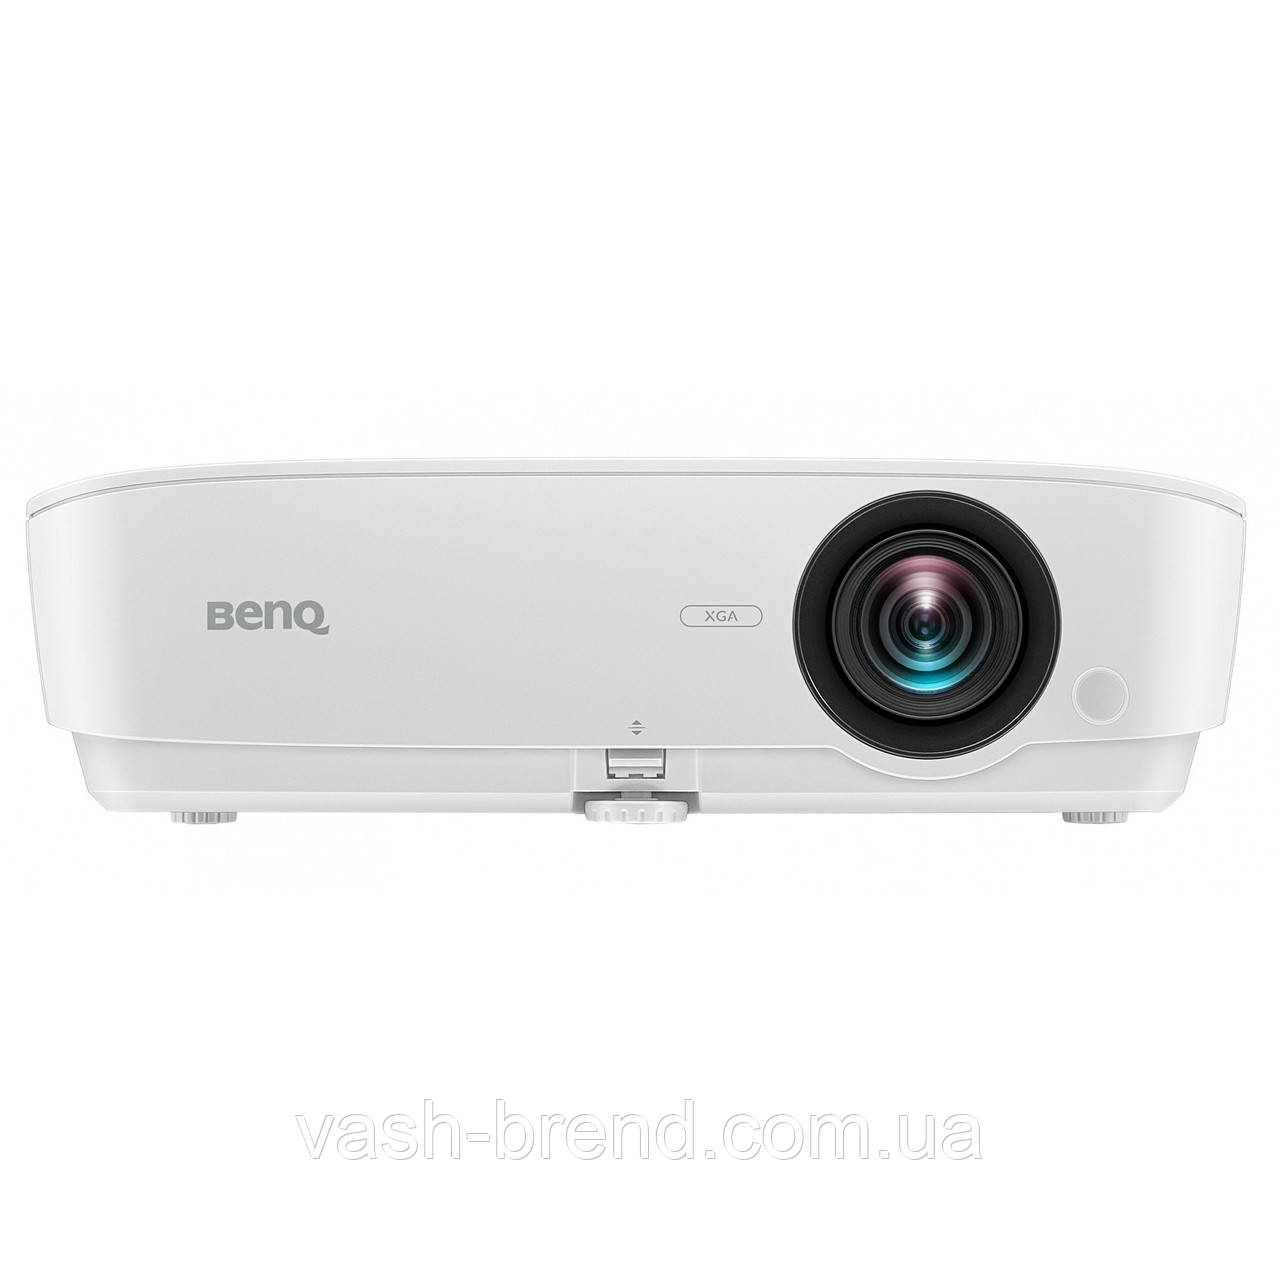 Проектор BENQ MX532 9H JG677 33E